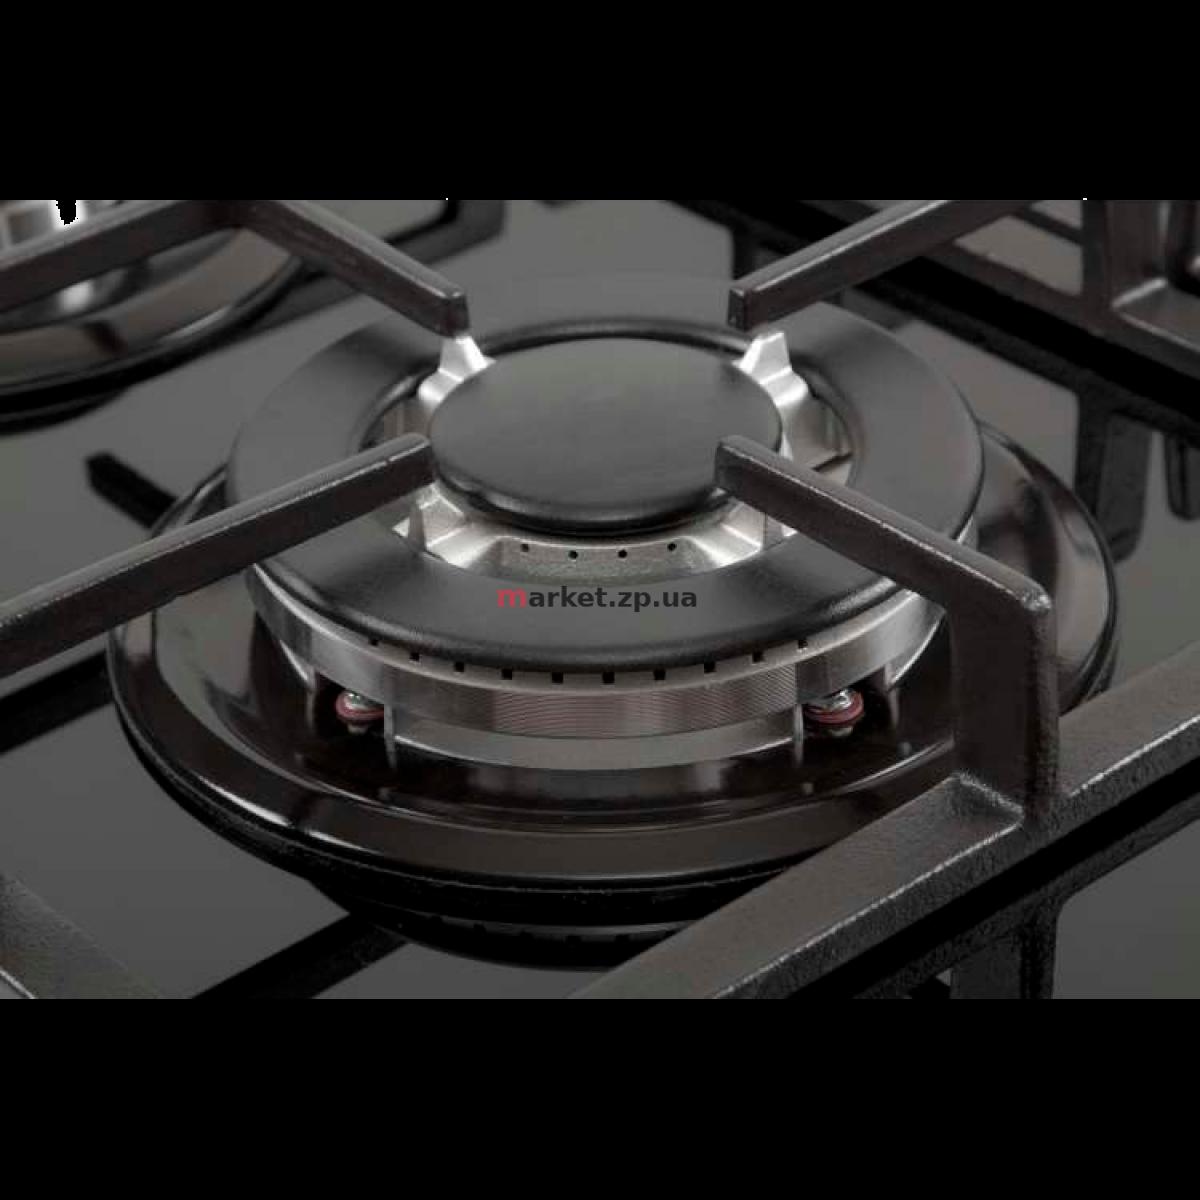 Варочная поверхность газовая VENTOLUX HG C7G CEST (BK)